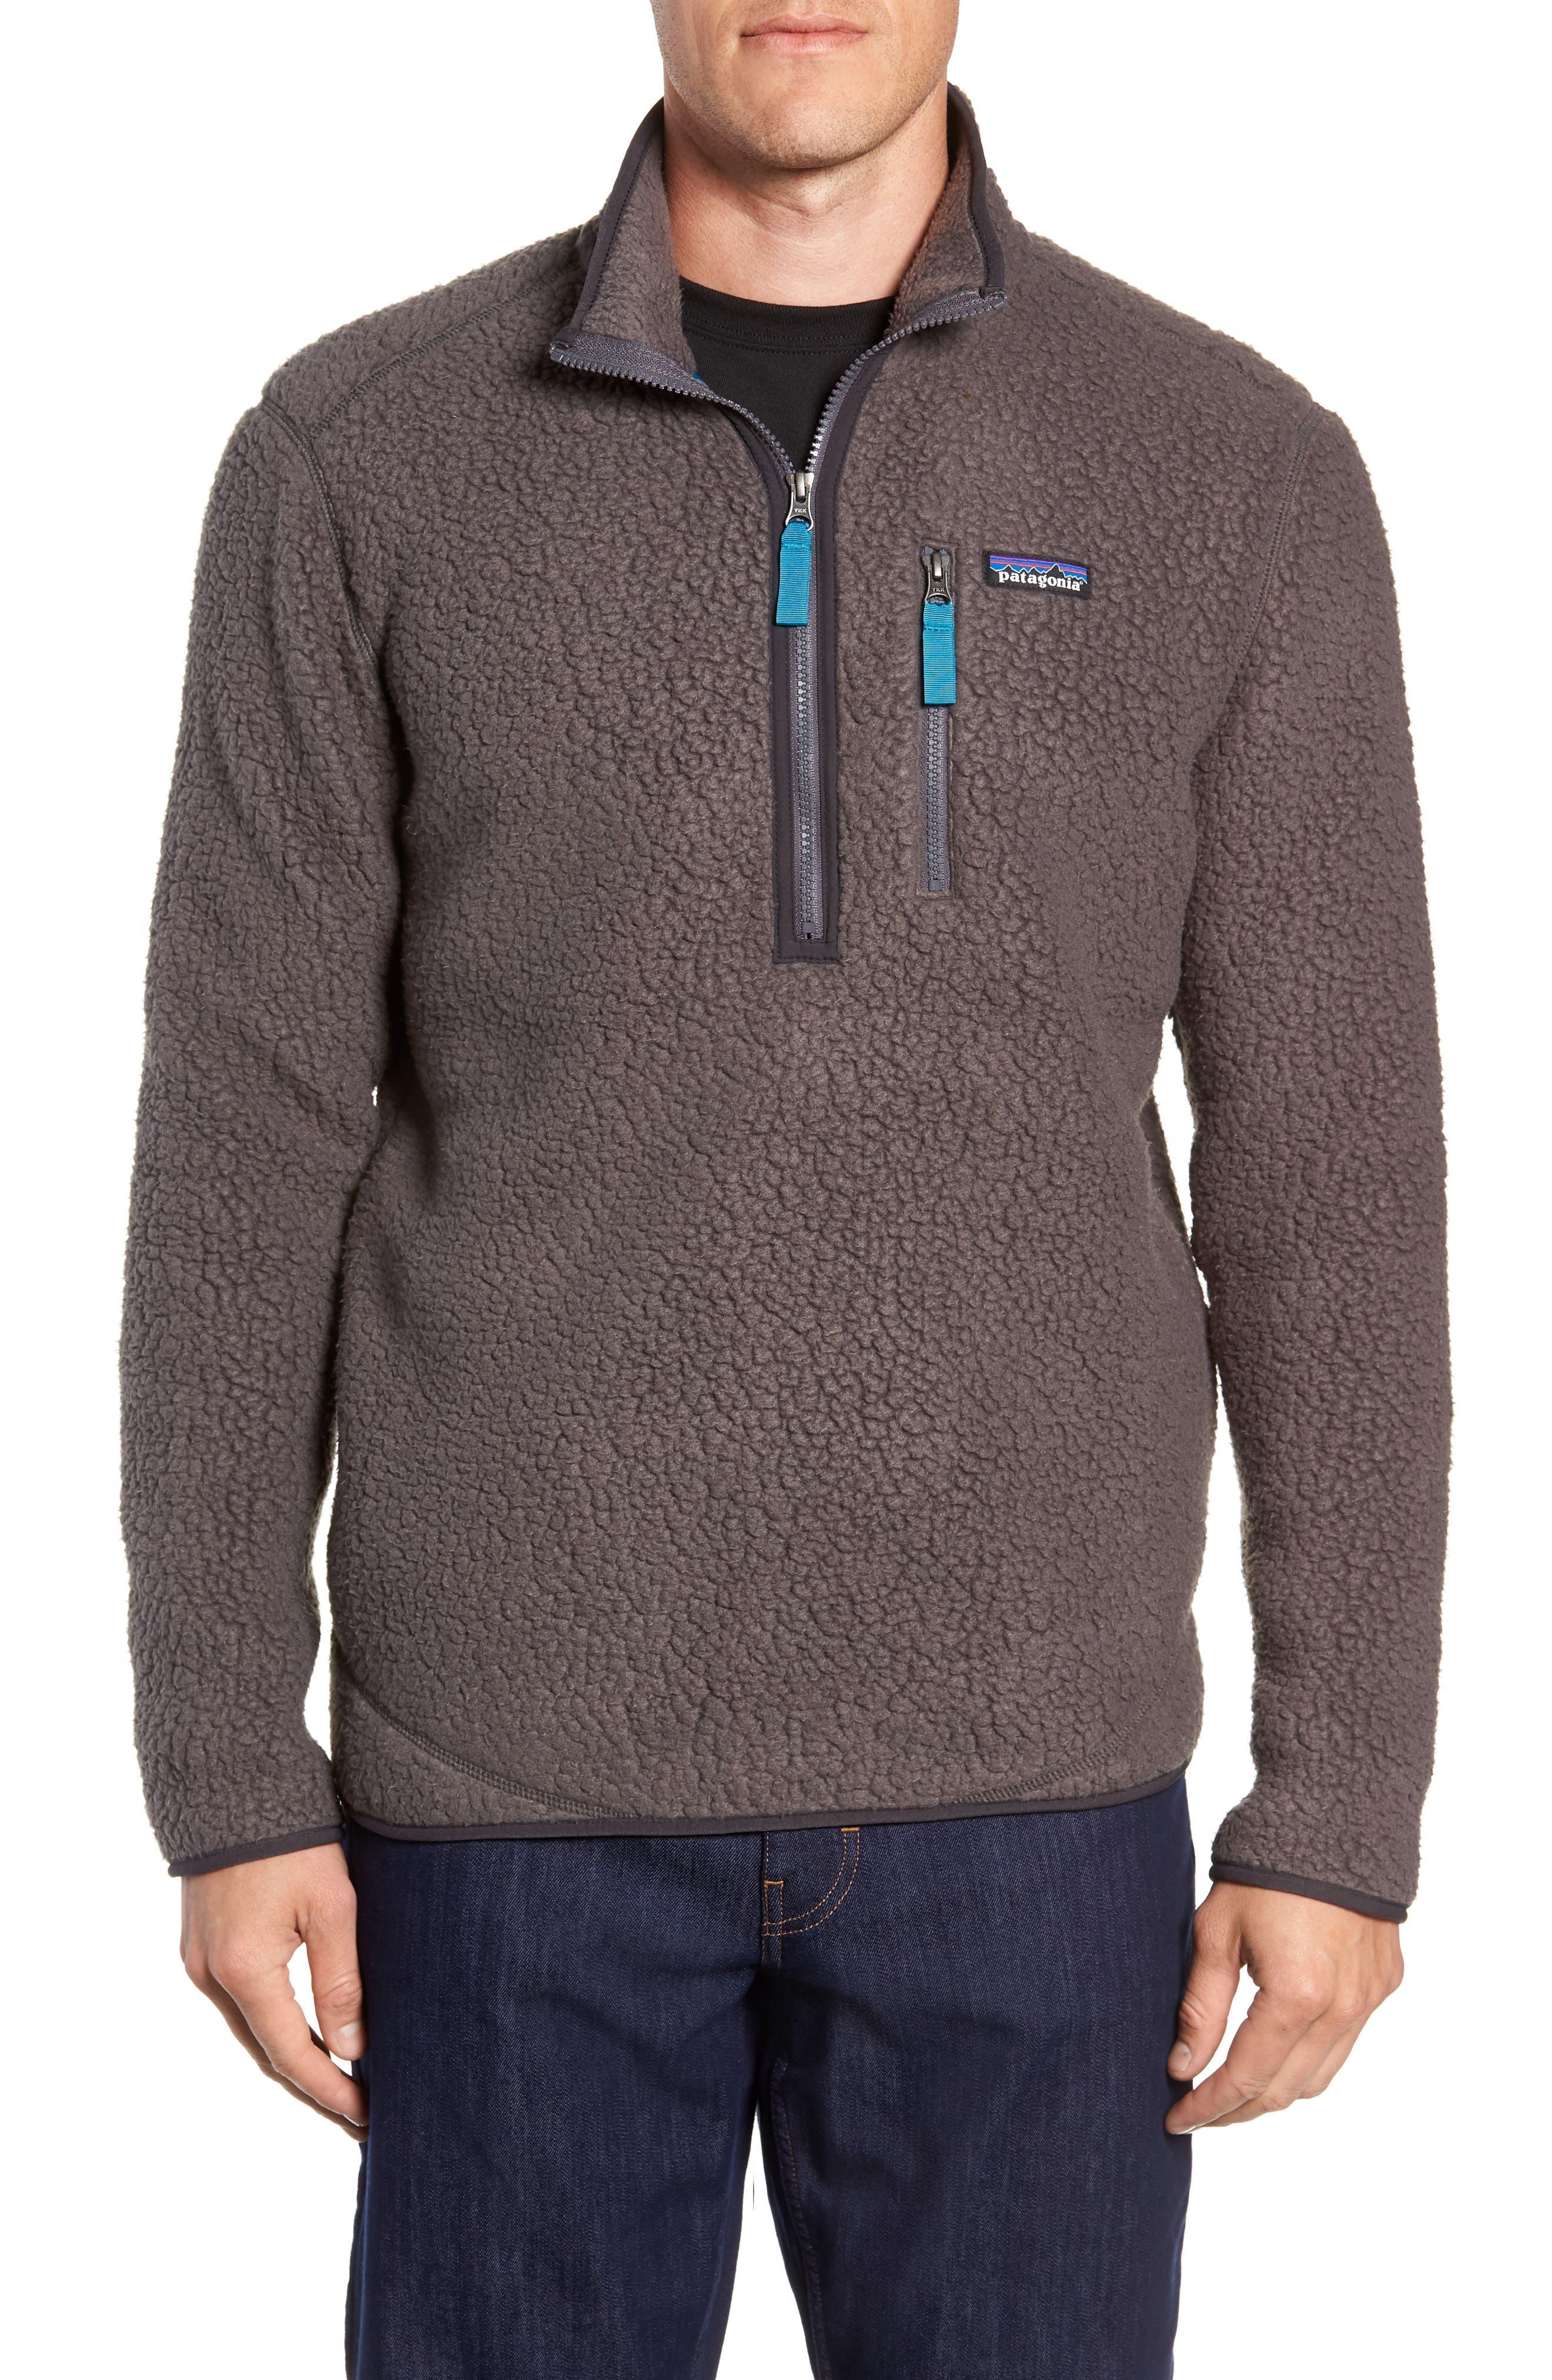 Retro Pile Fleece Zip Jacket,                             Main thumbnail 1, color,                             FORGE GREY